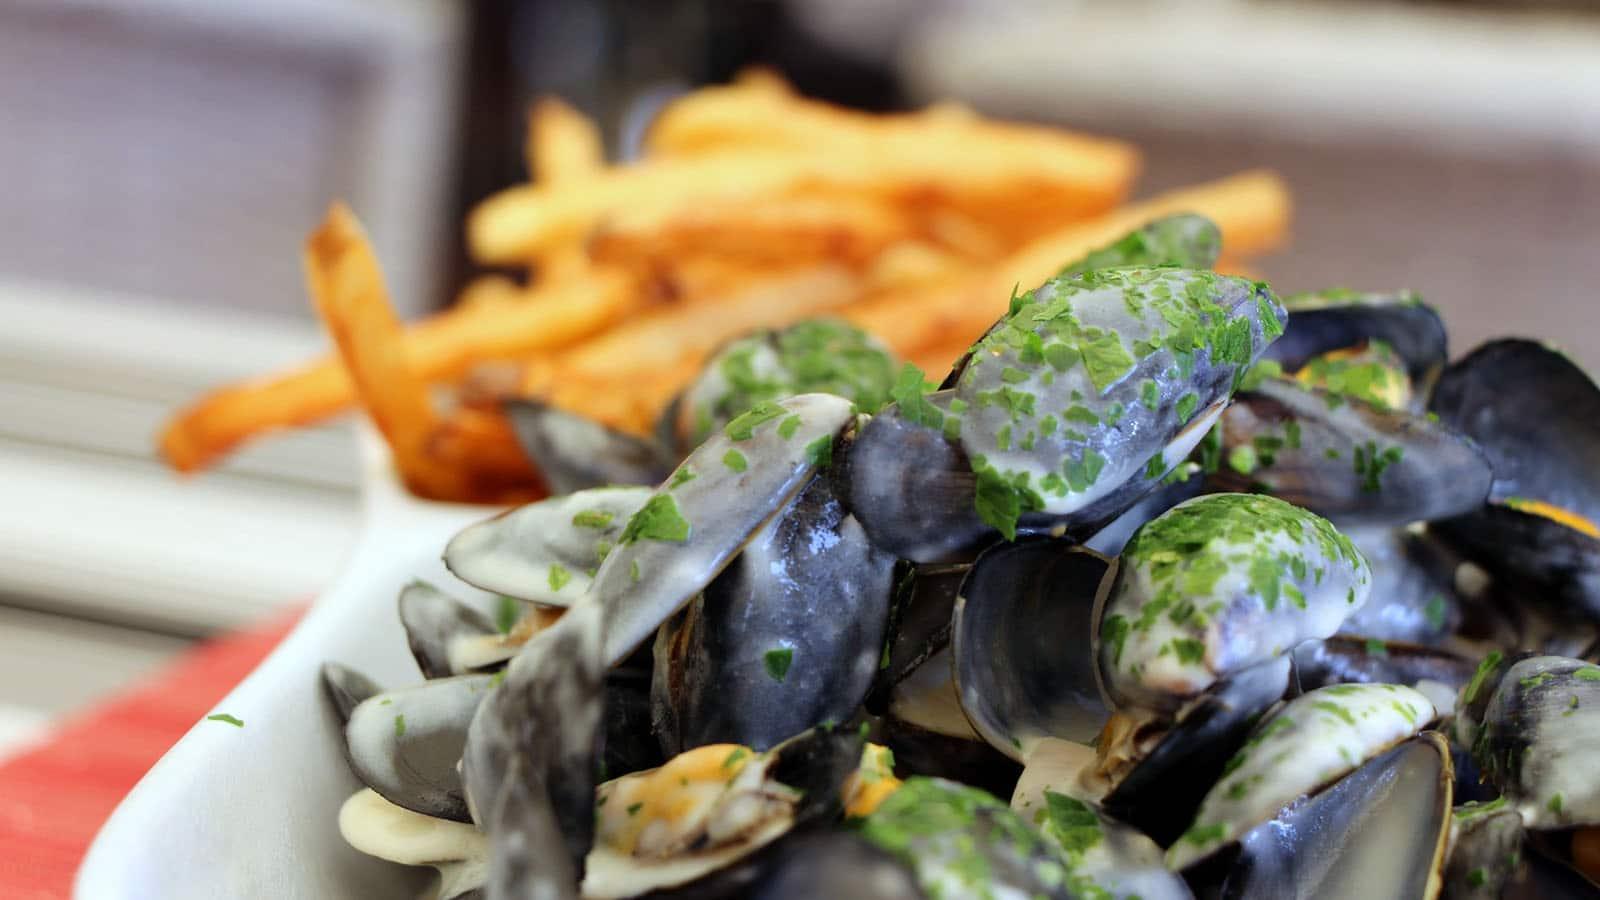 miesmuscheln-nach-sumpfart-rezepte-pays-de-saint-jean-de-monts